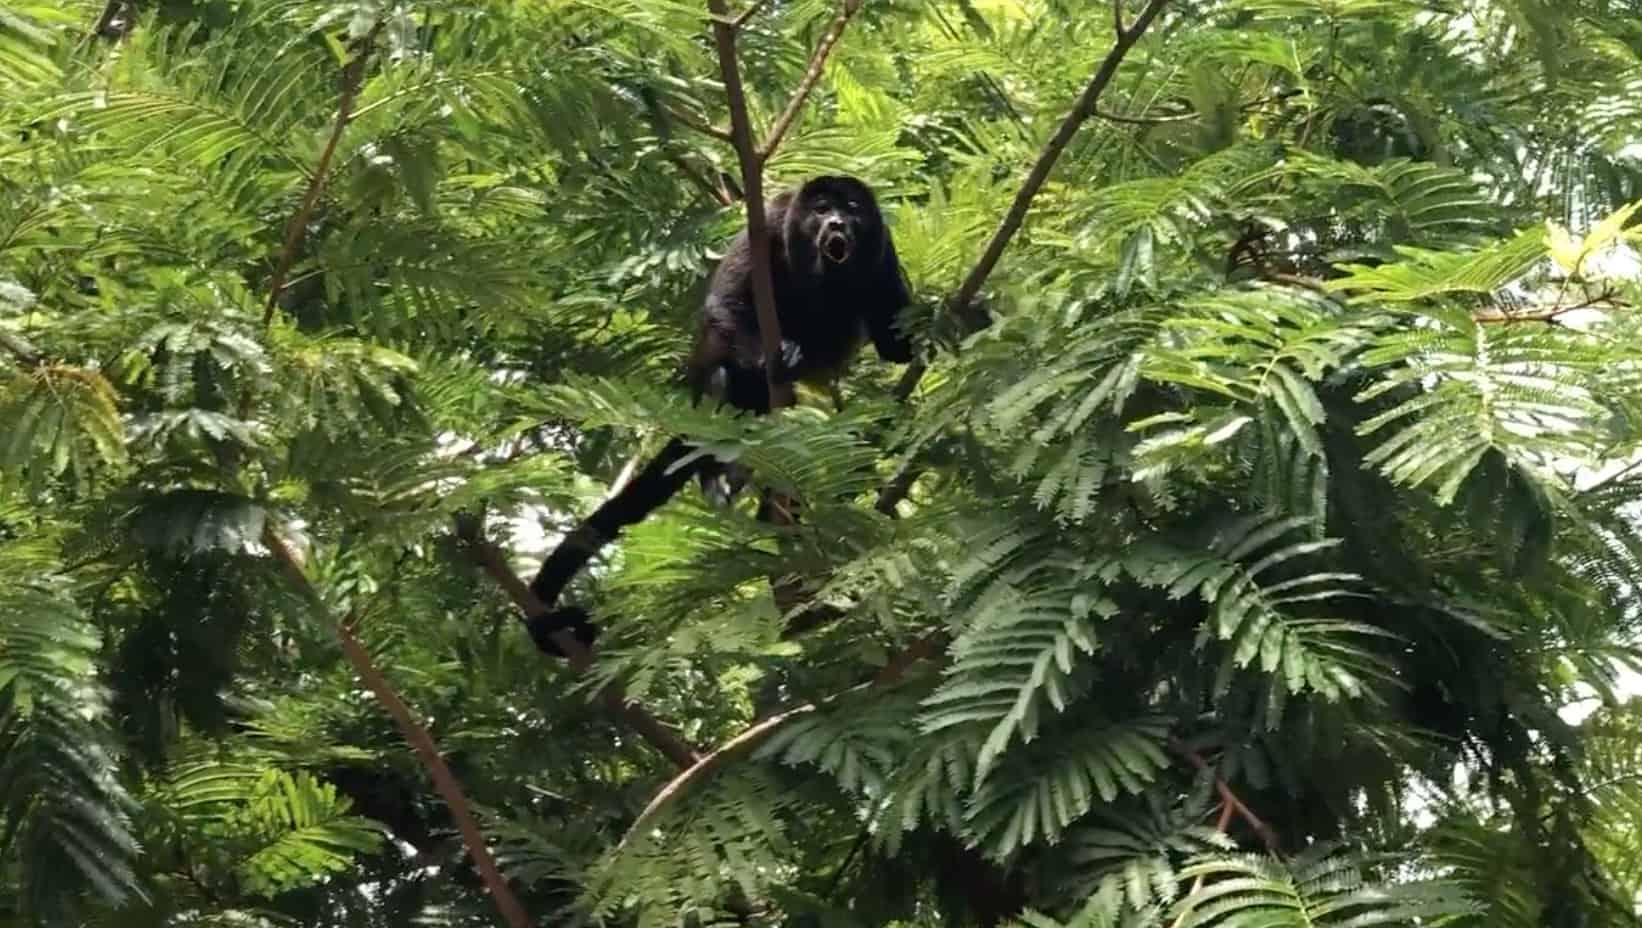 Howler monkey in Potrero, Guanacaste, Costa Rica.